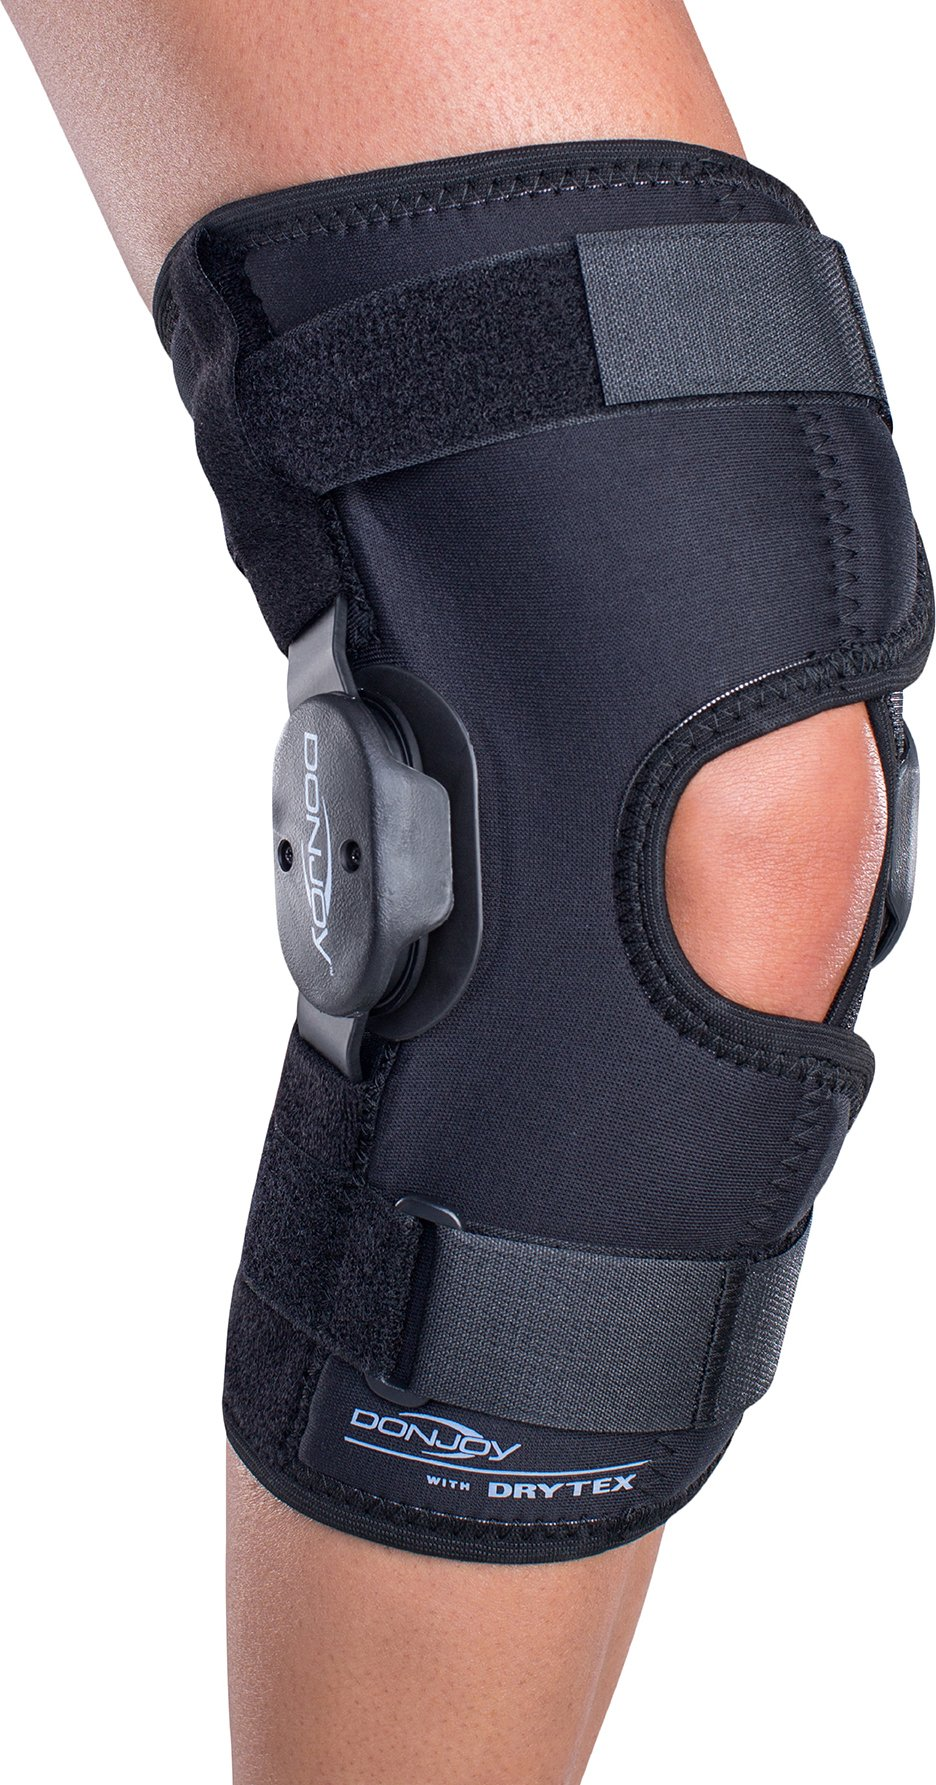 DonJoy Deluxe Hinged Knee Brace, Drytex Wrap Around, Open Popliteal, Small